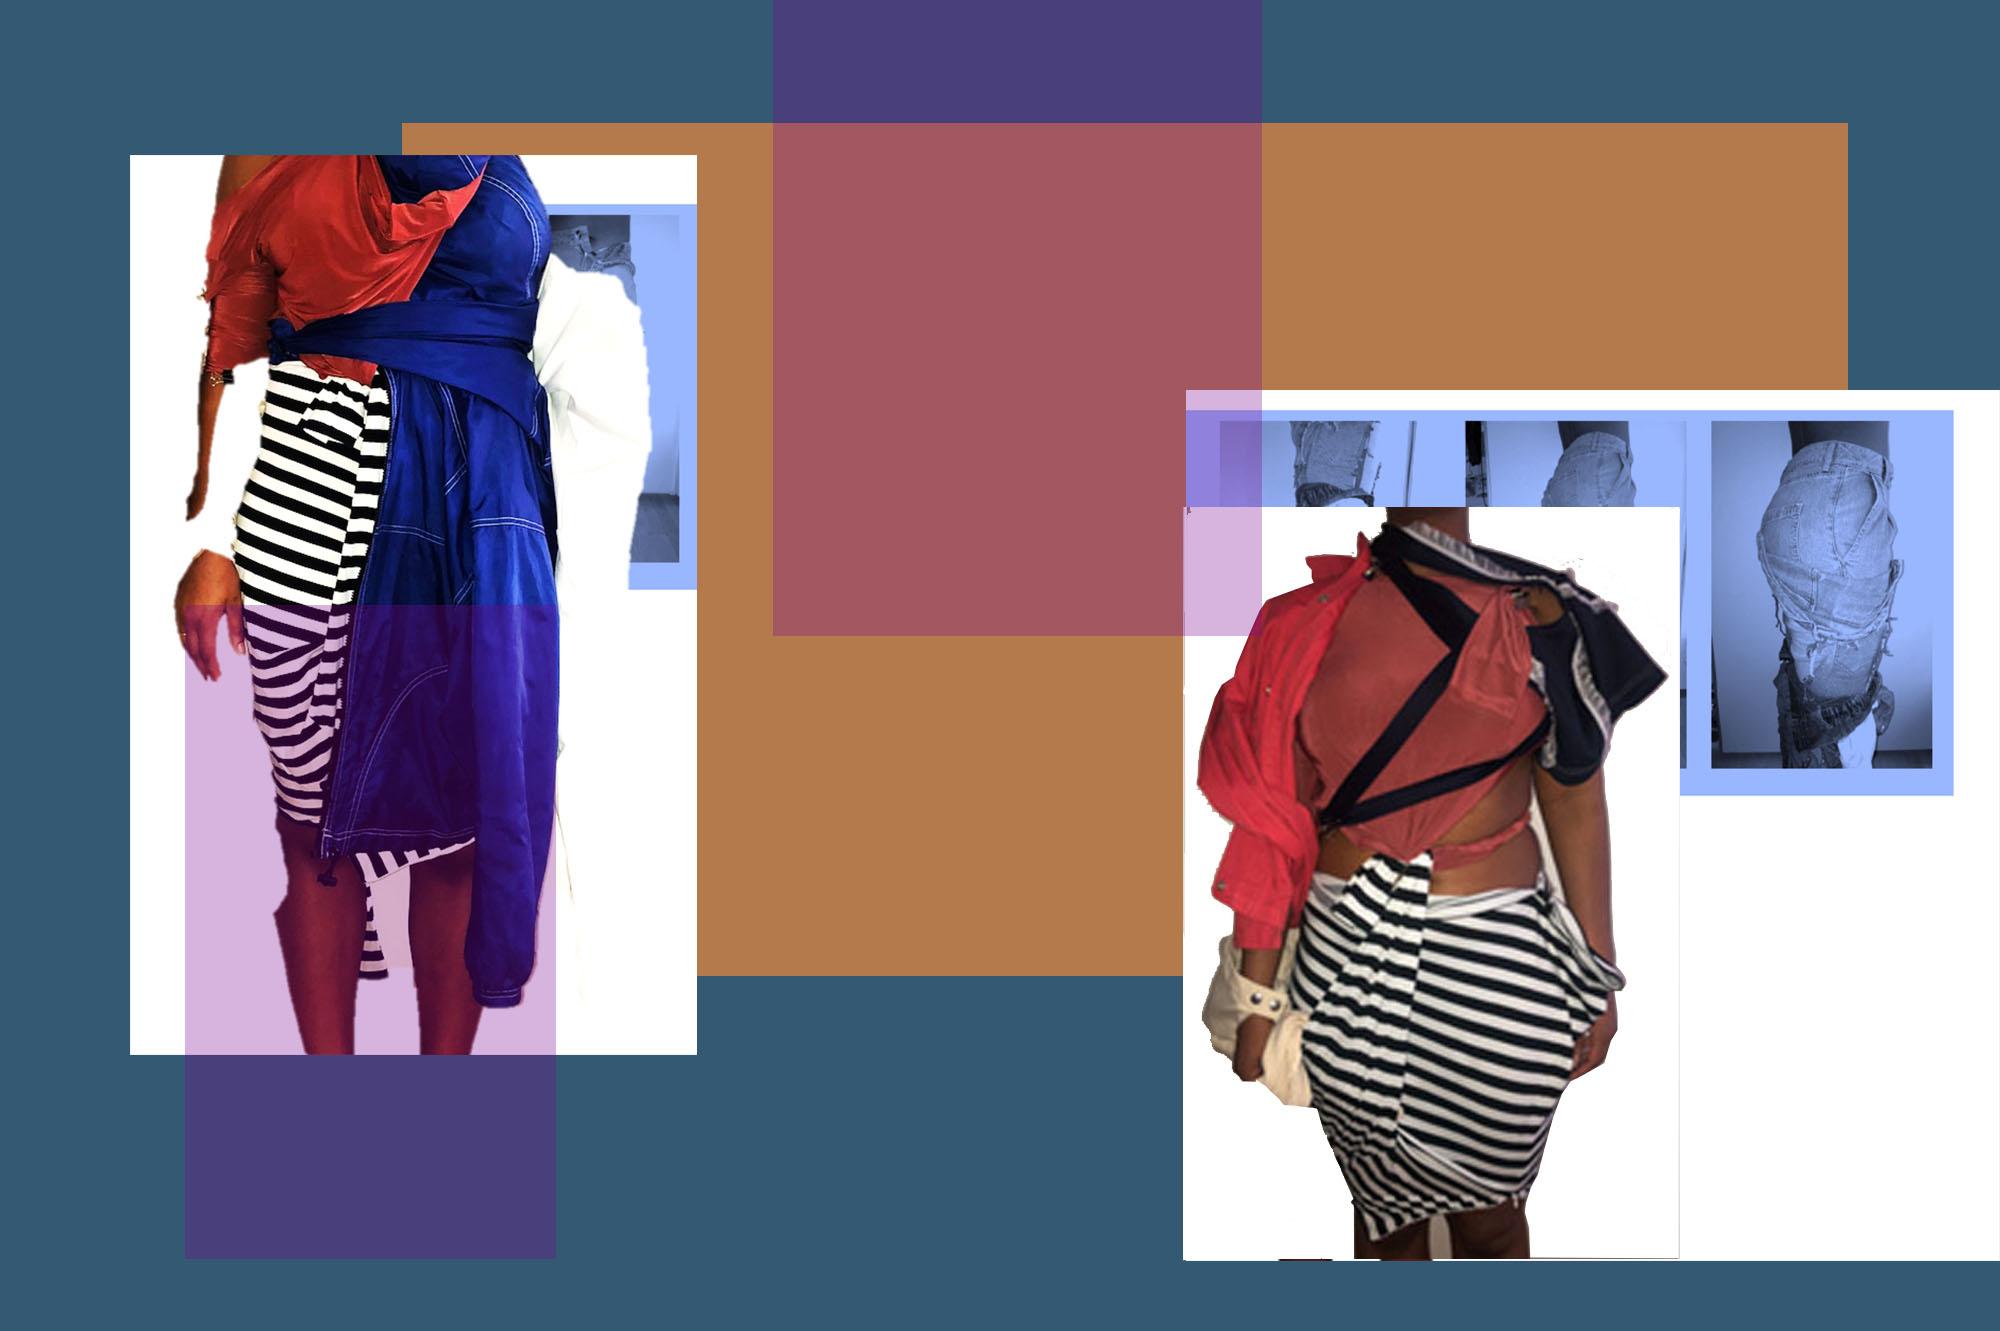 2 fashion drape experiments on female body